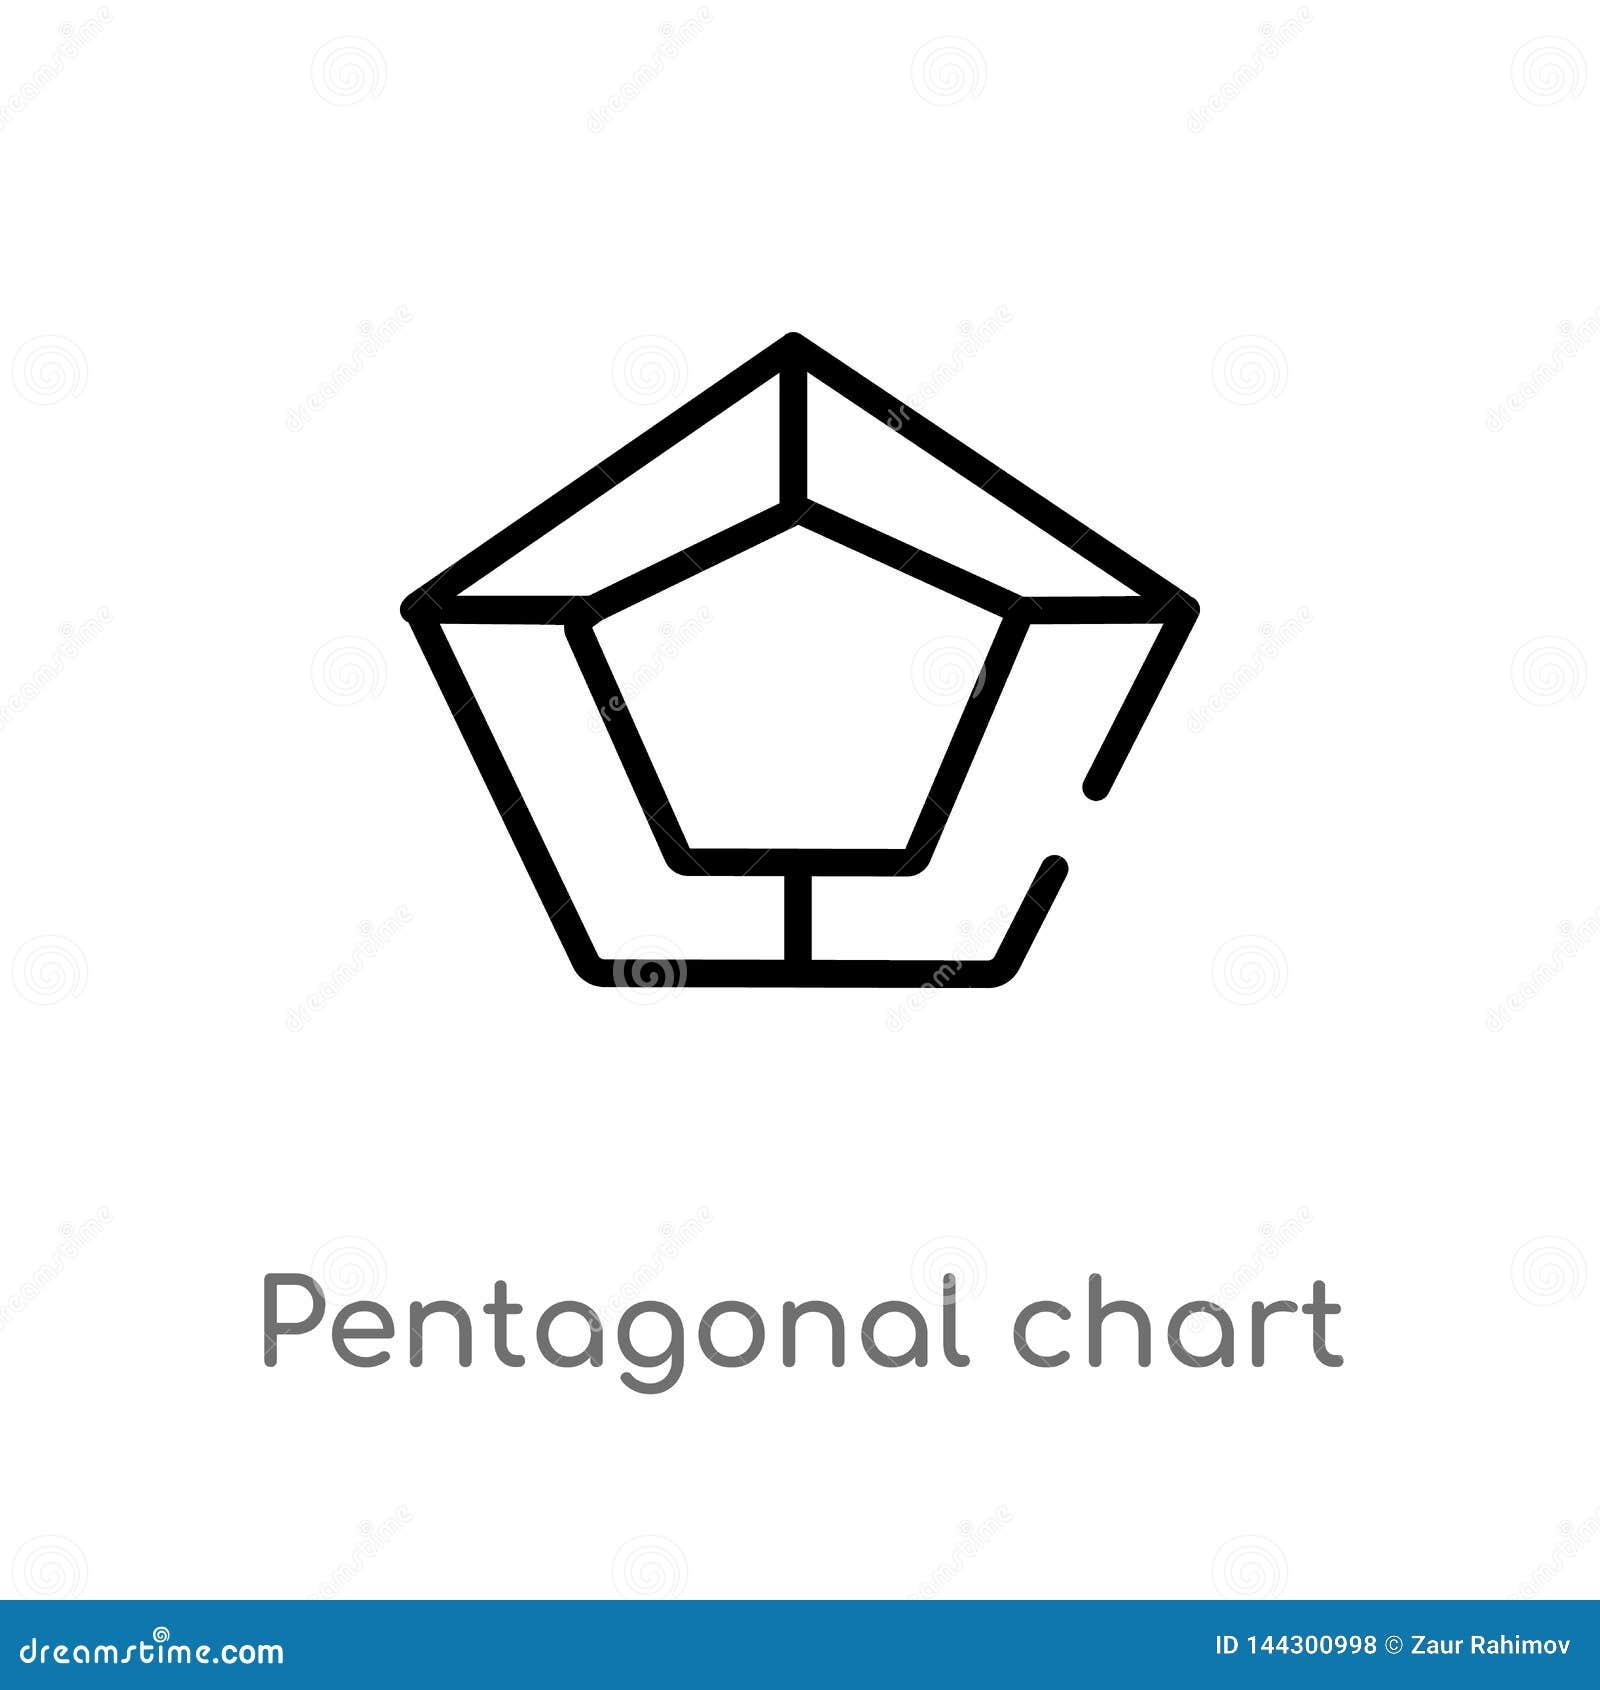 Icono pentagonal del vector de la carta del esquema l?nea simple negra aislada ejemplo del elemento del concepto de la interfaz d